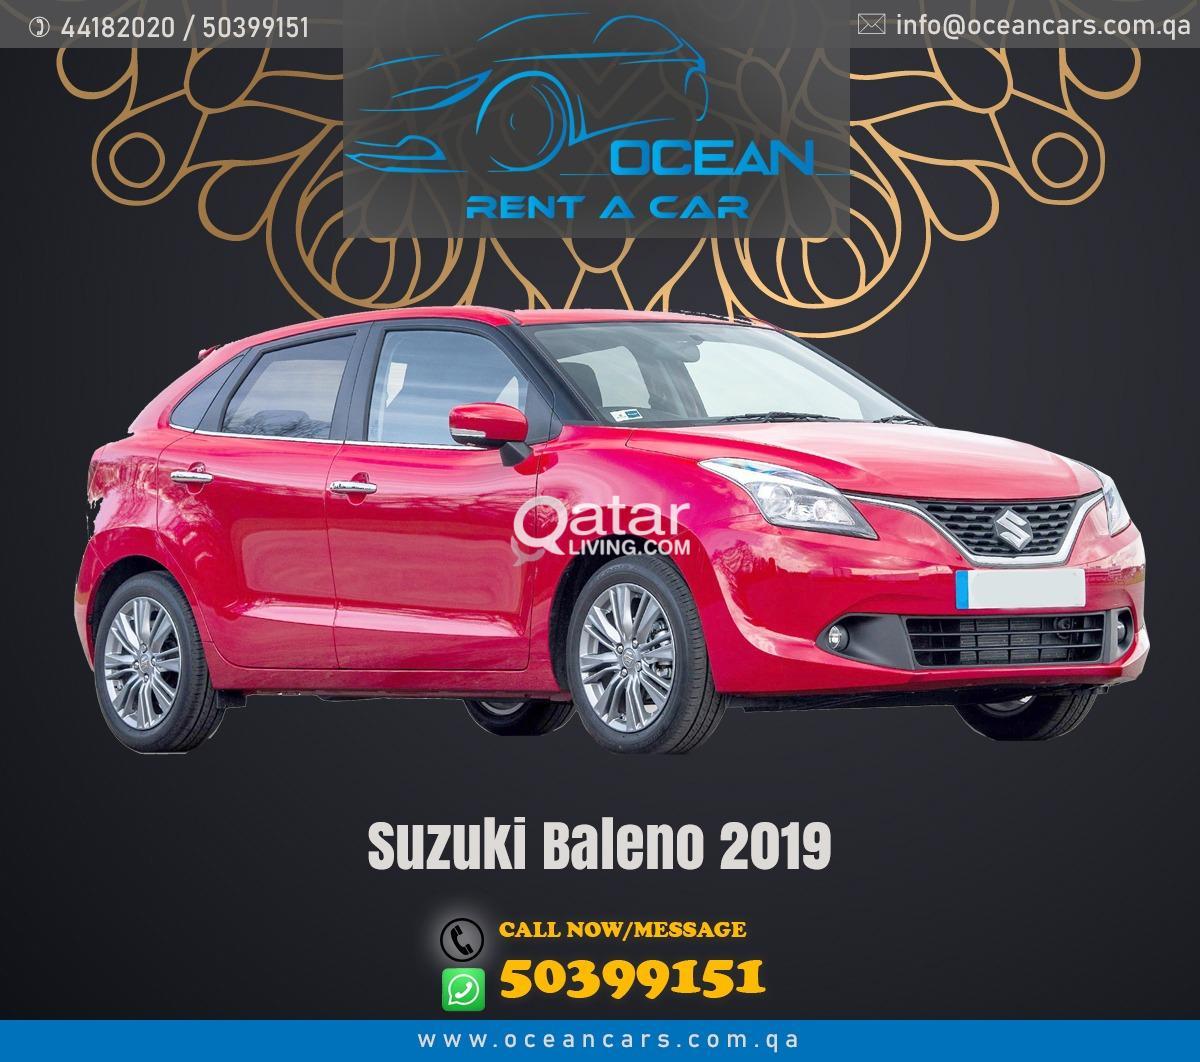 SUZUKI BALENO 2019 MODEL ONLY 455 QAR FOR WEEKLY